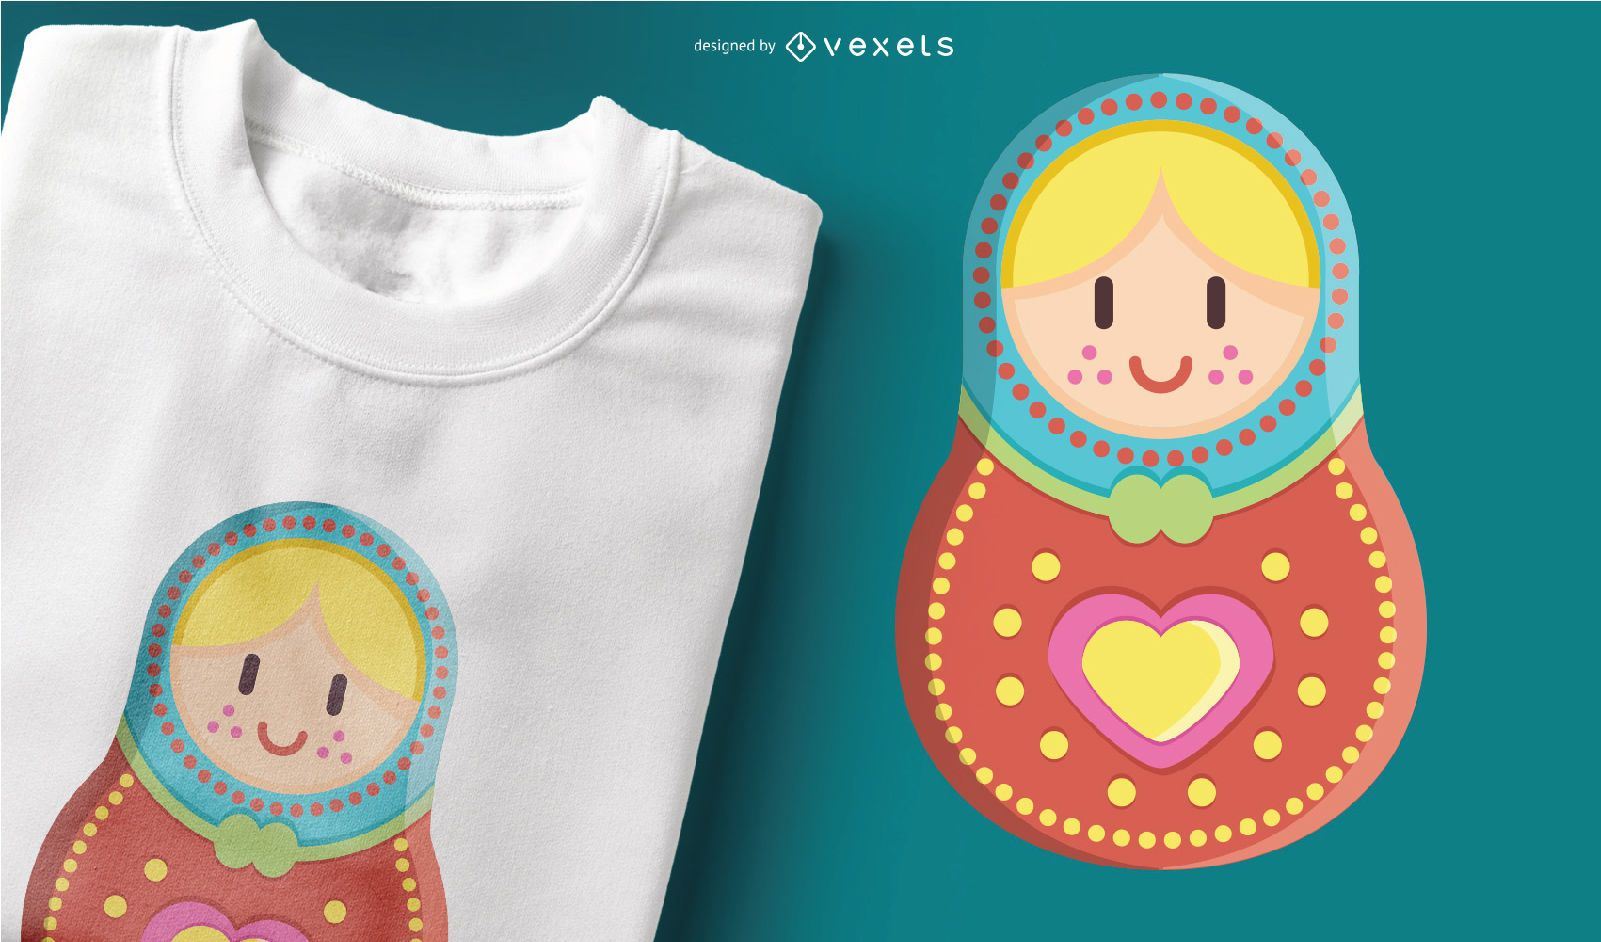 Cute Matryoshka Russian Doll Colorful T-shirt Design